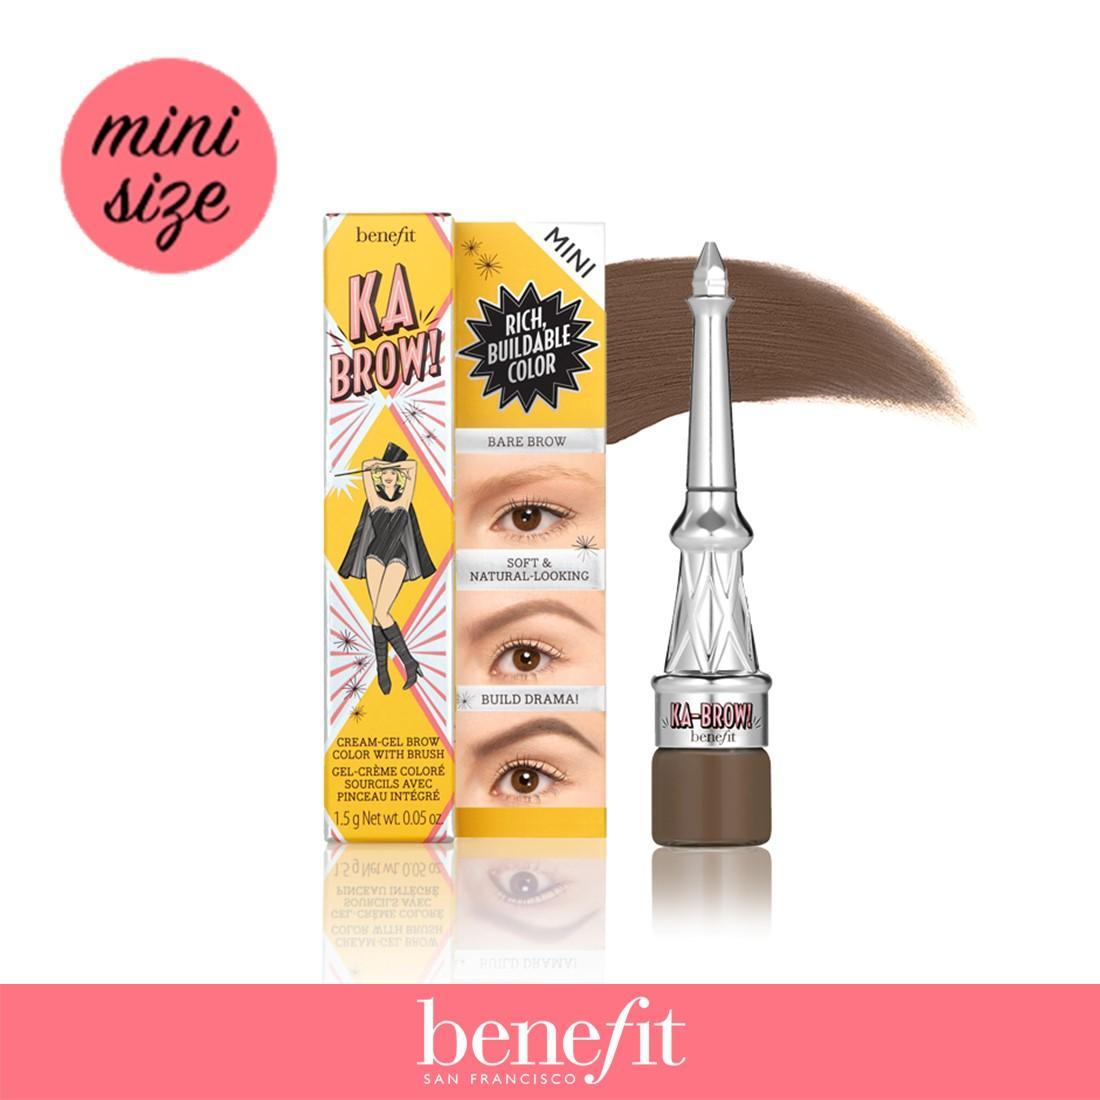 Benefit Ka-BROW! Eyebrow Cream-Gel Color Mini